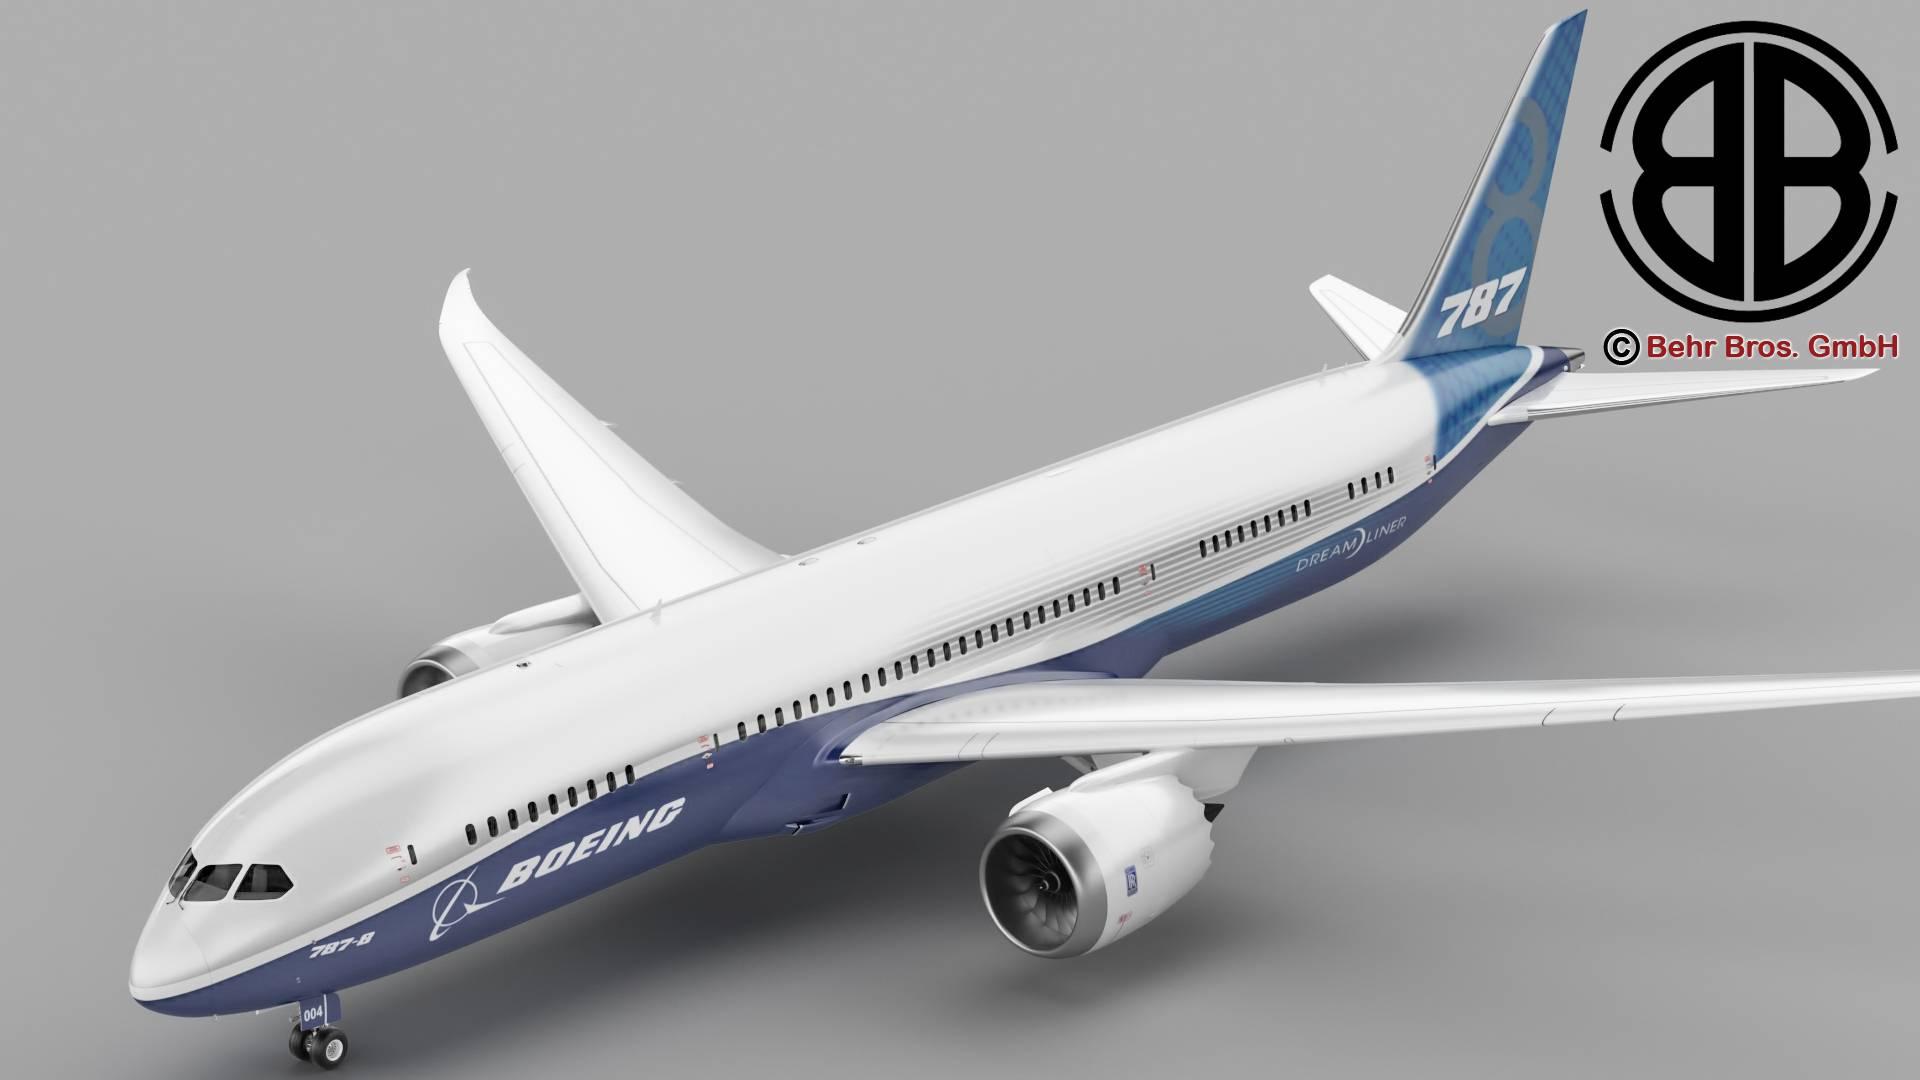 boeing 787-8 3d model 3ds max fbx c4d lwo ma mb obj 251346